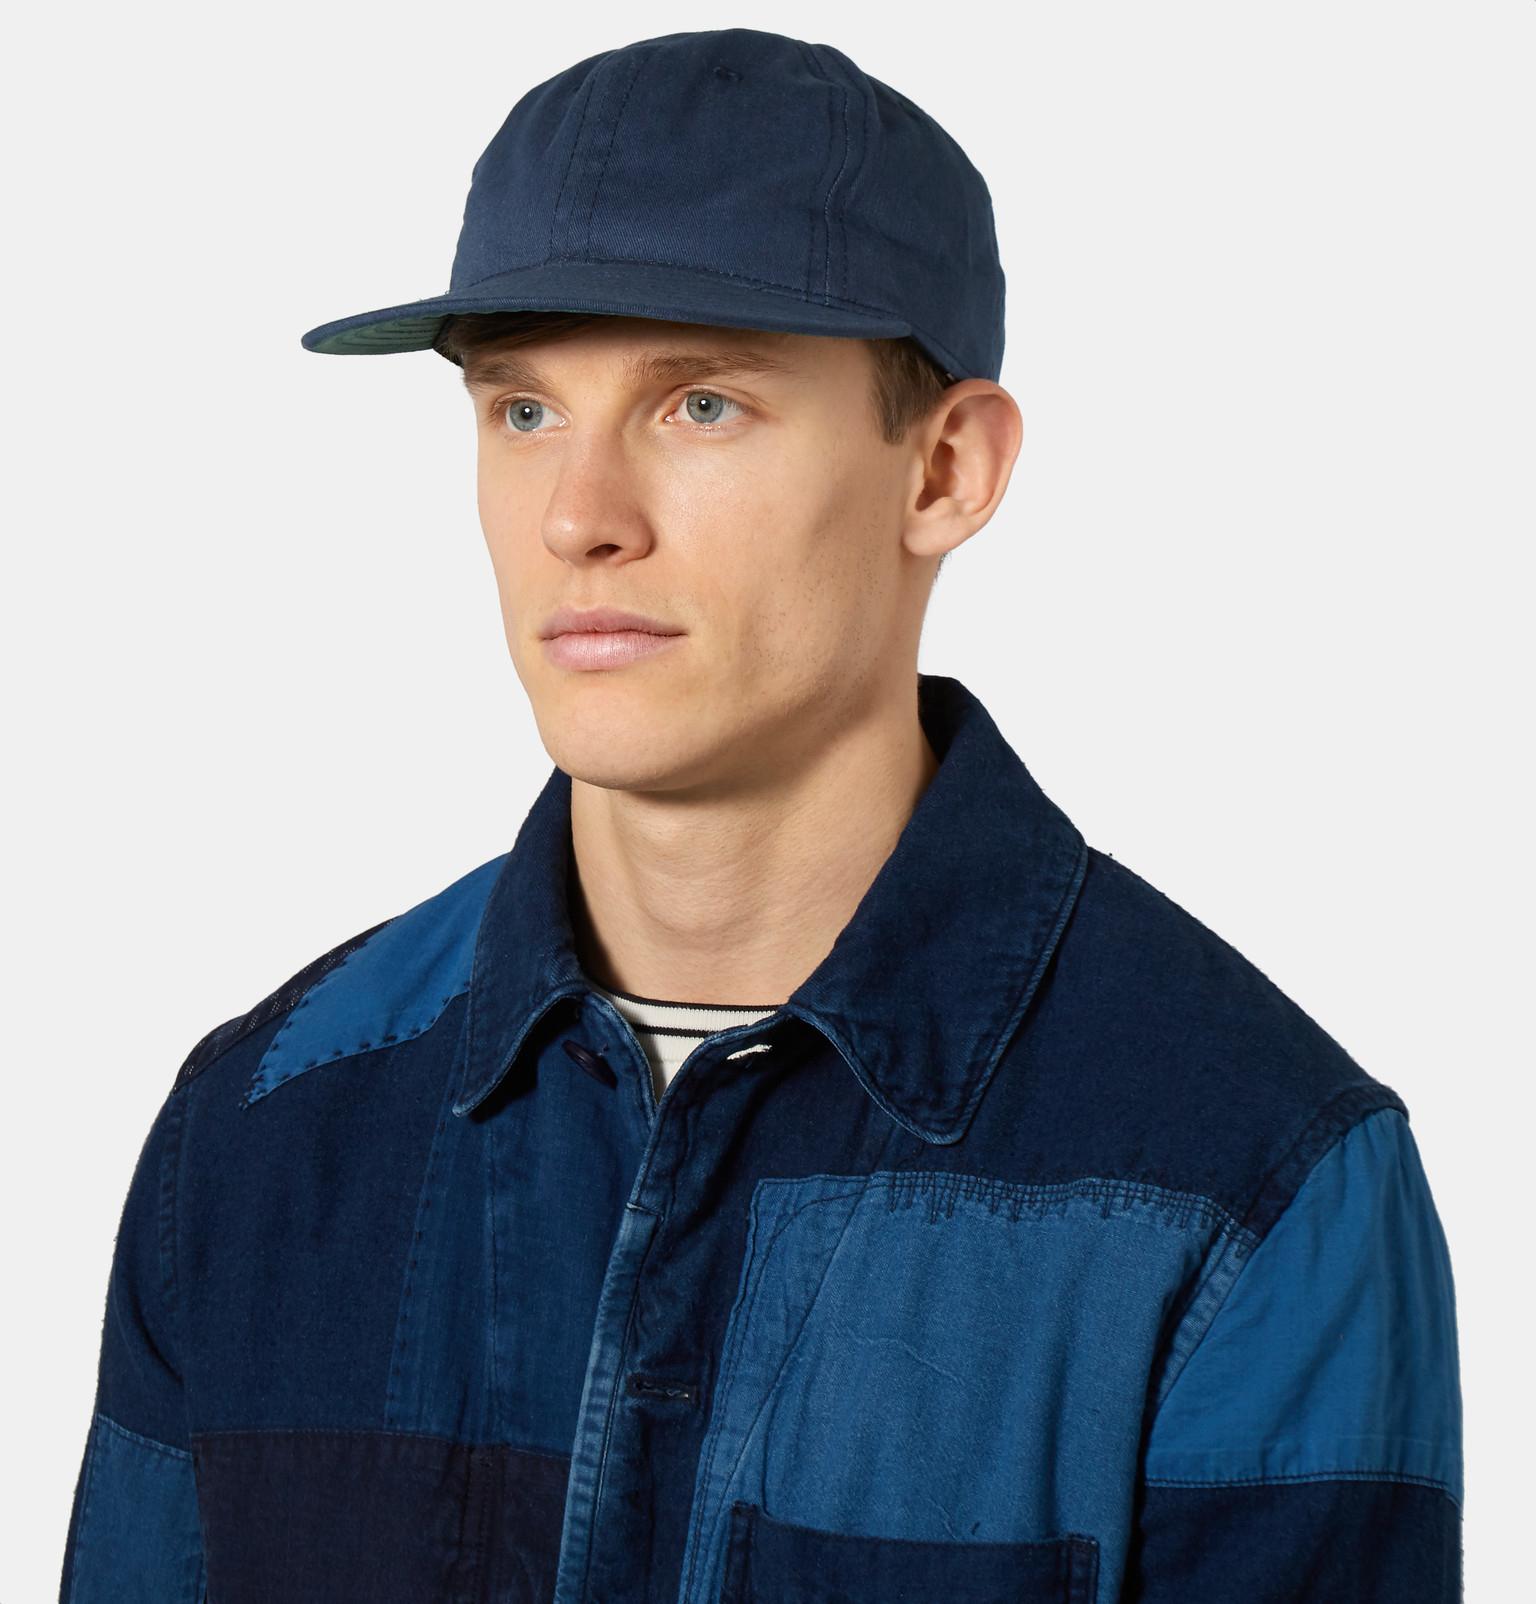 Ebbets Field Flannels Cotton-twill Baseball Cap in Blue for Men - Lyst d8f387bb40b